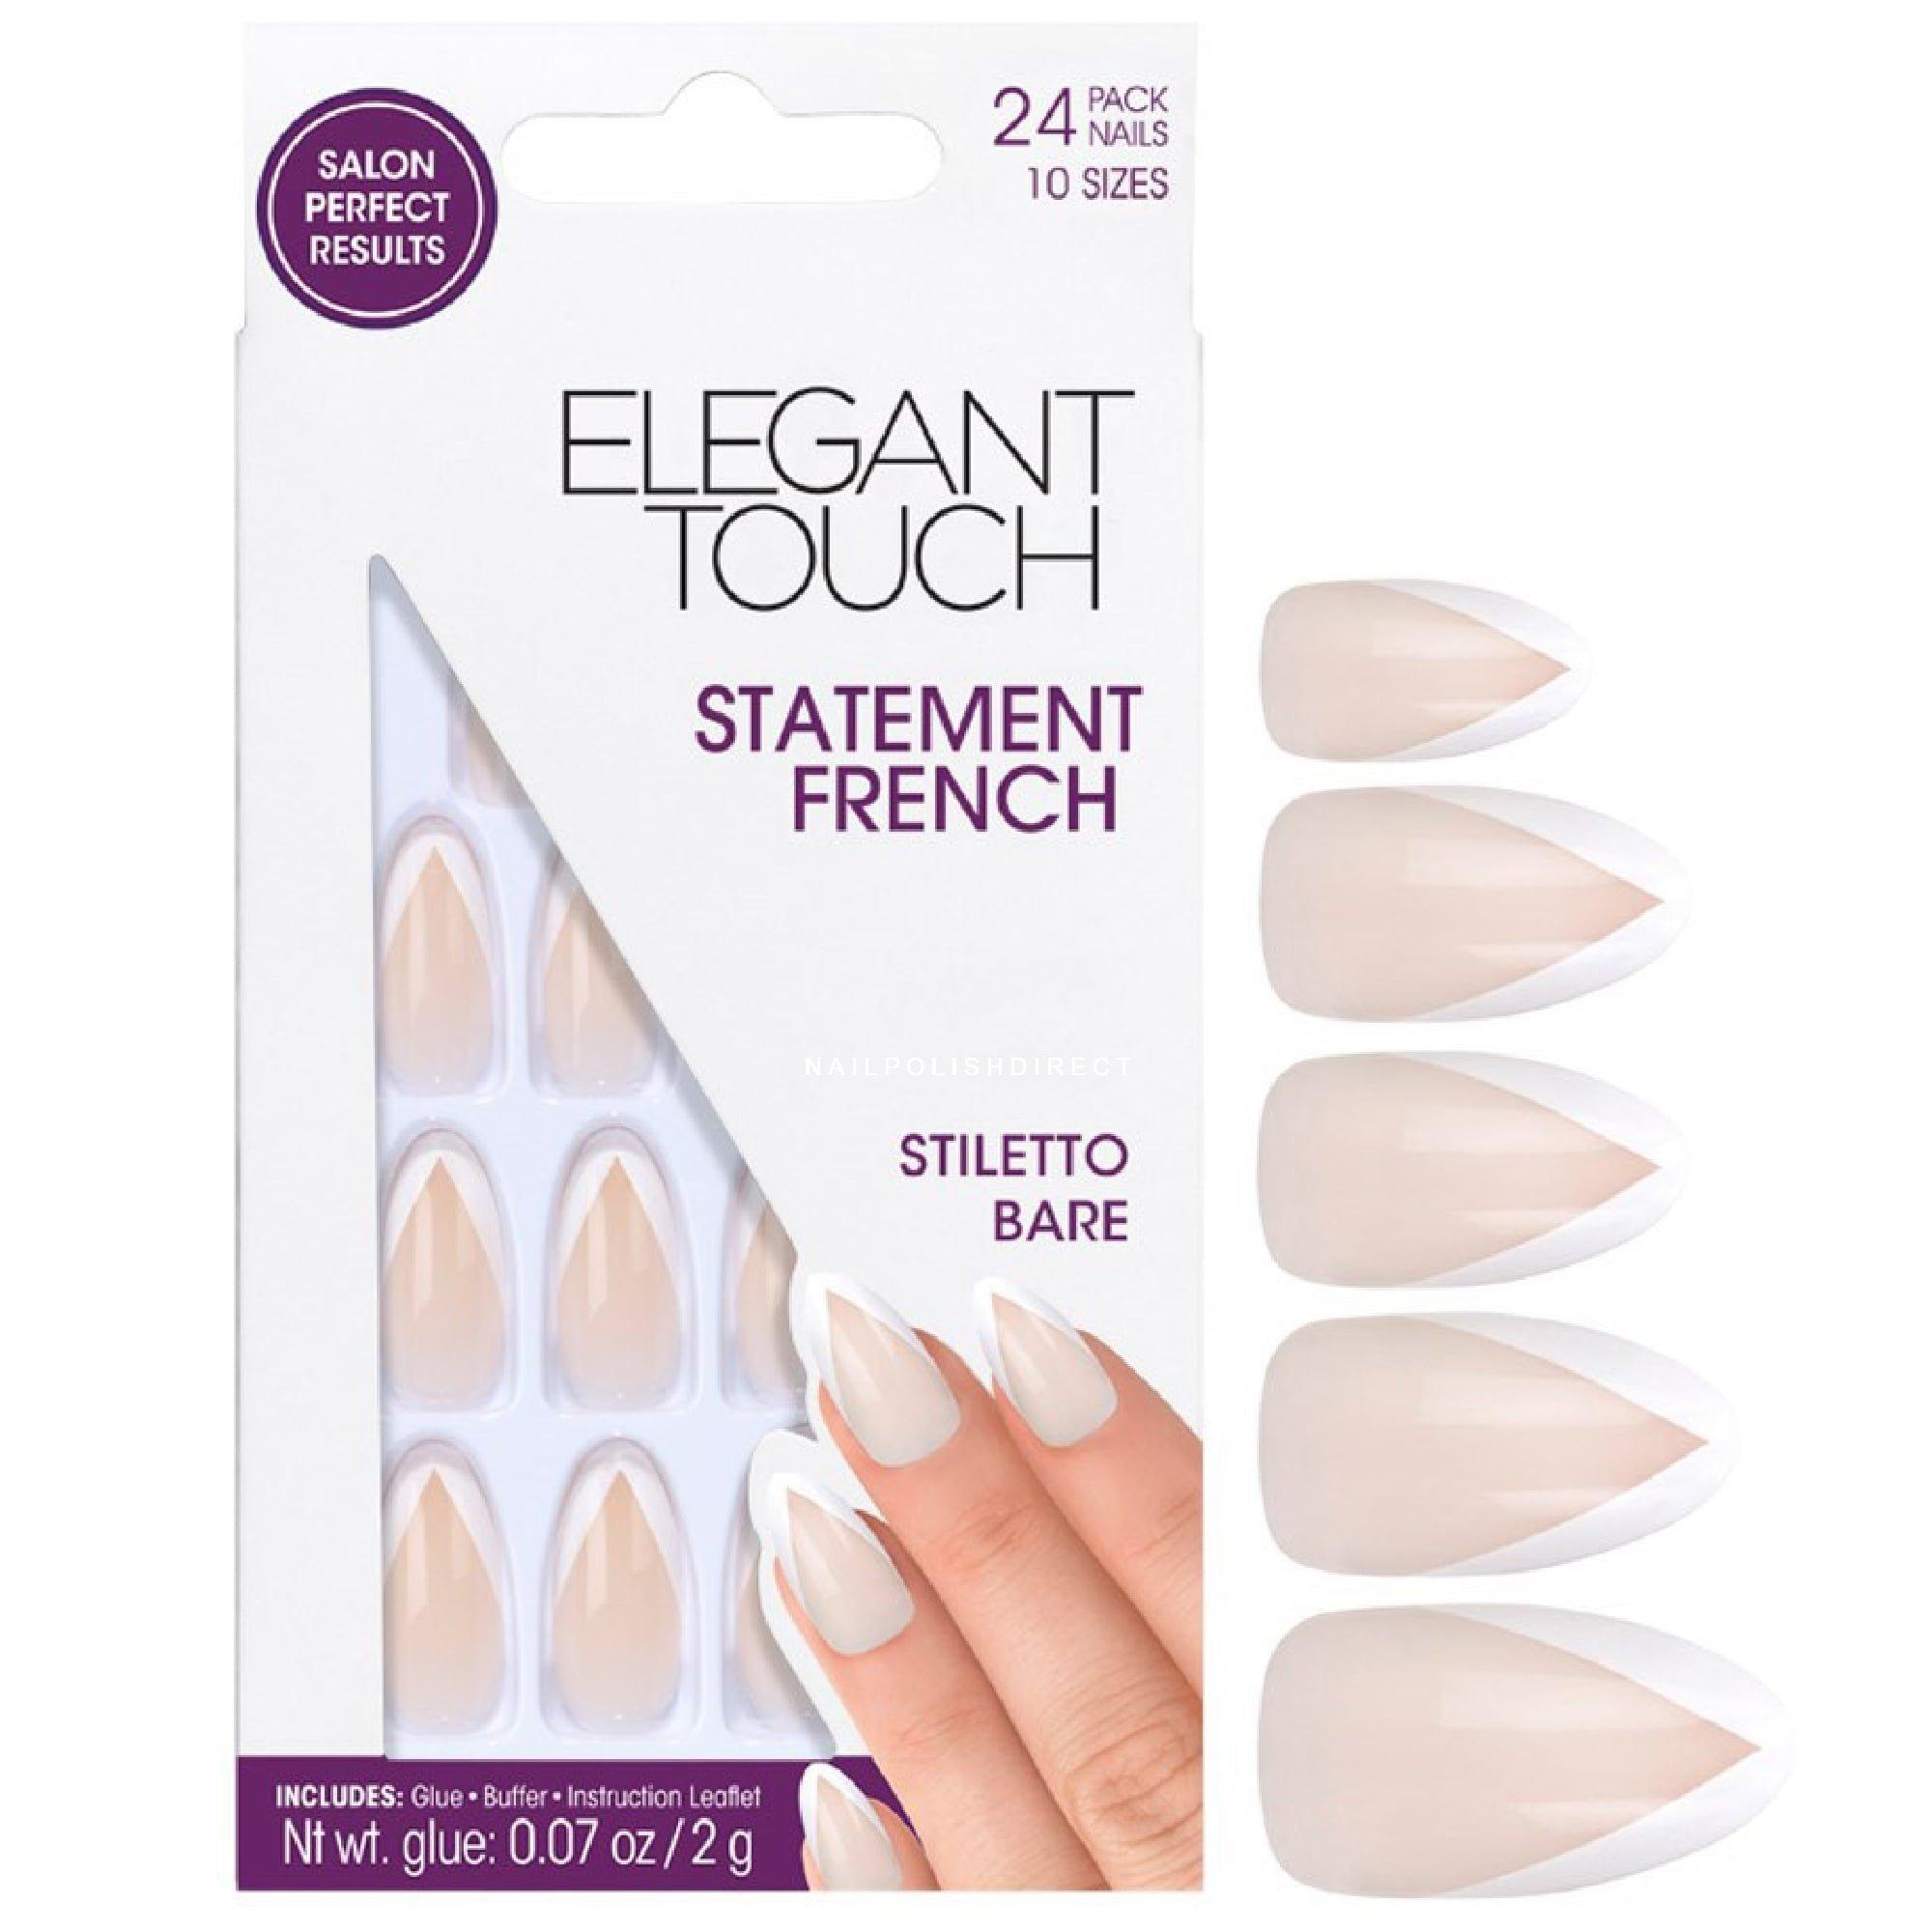 Elegant Touch False Nails - Stiletto Bare + Glue + Buffer